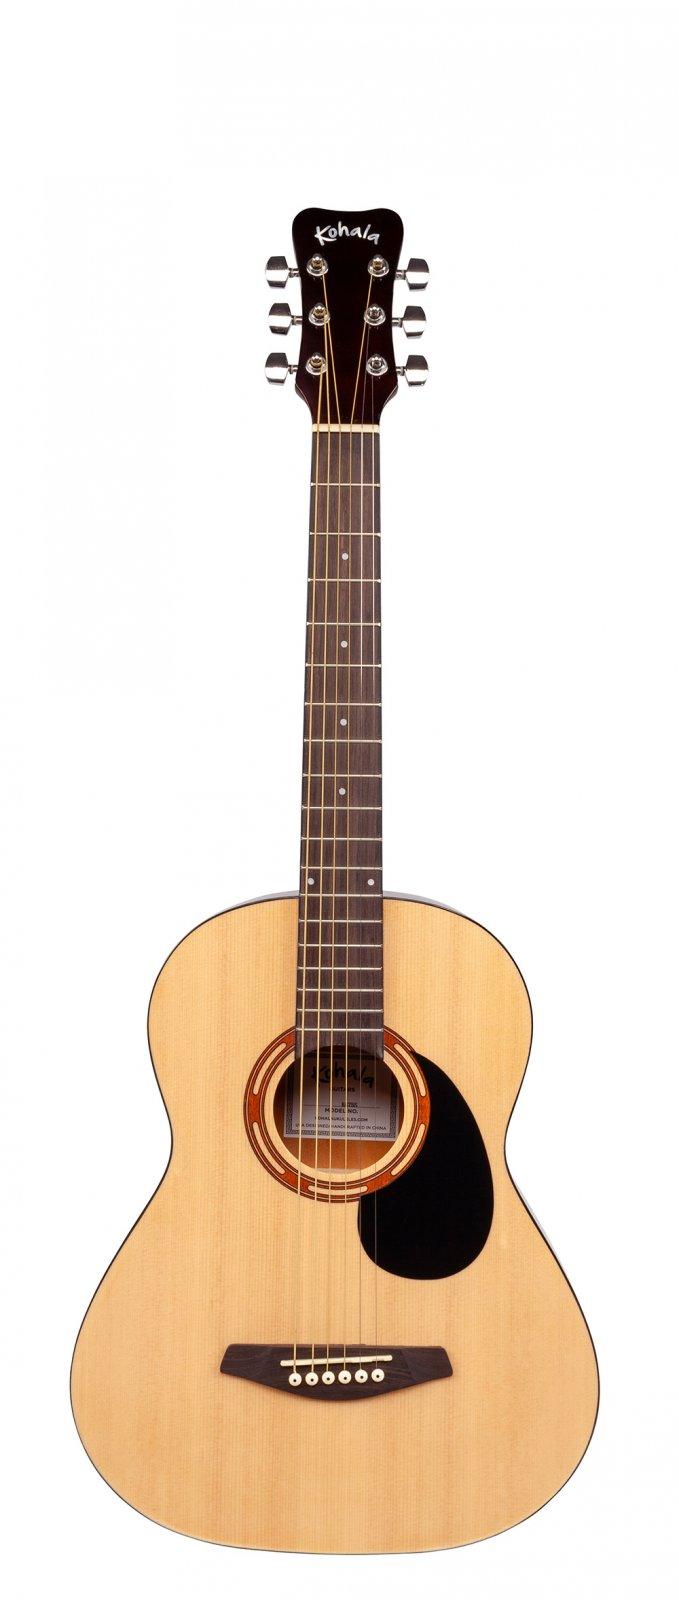 Kohala 3/4 Size Acoustic Guitar